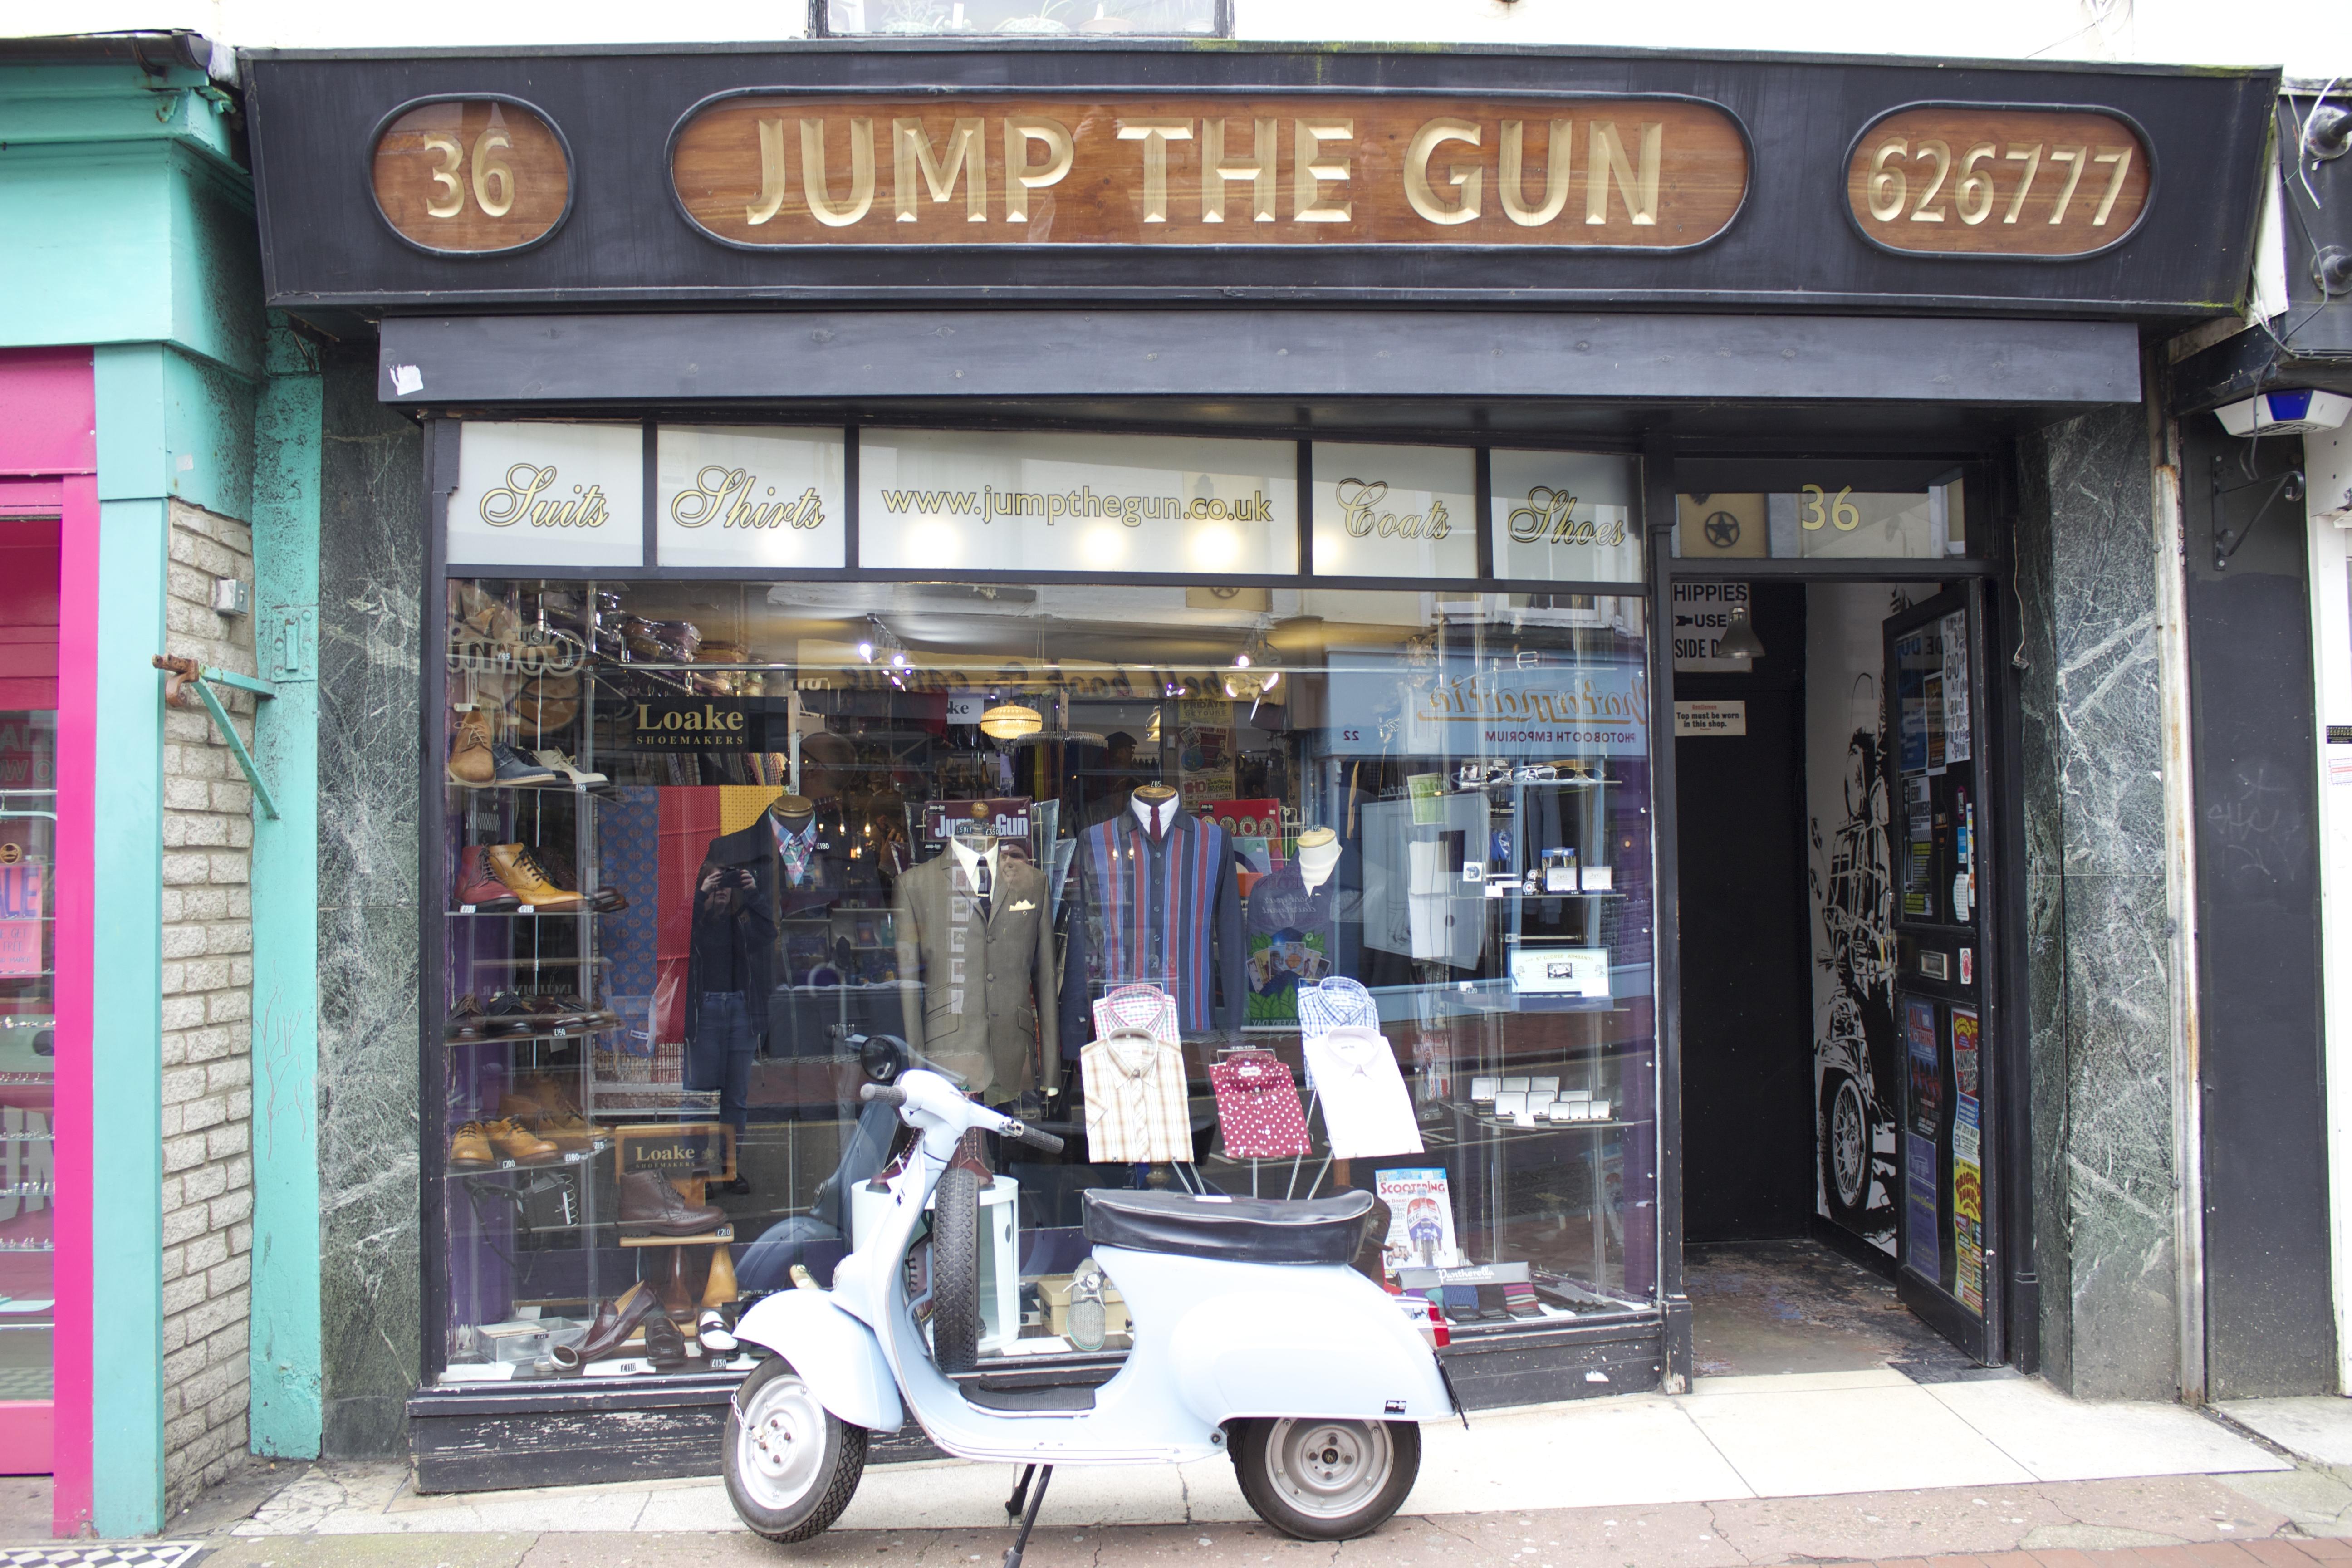 STYLE SHAKER #1: JUMP THE GUN